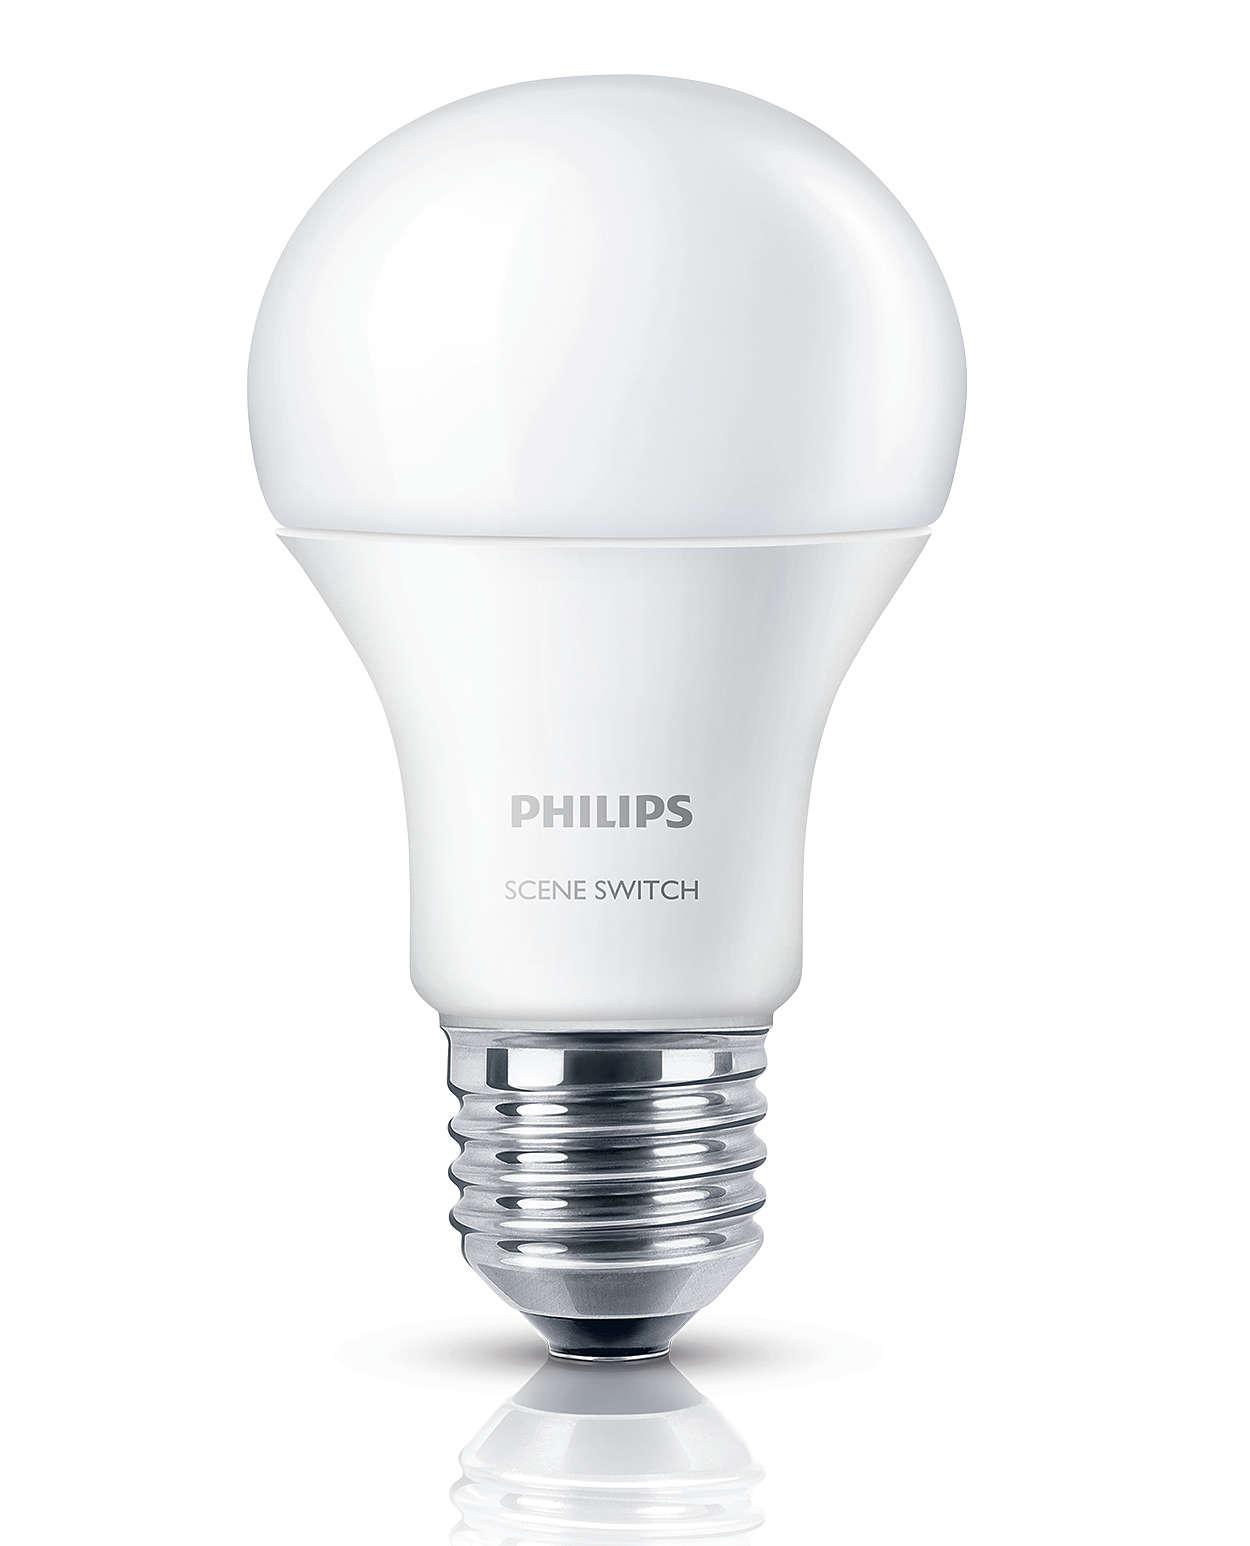 One bulb three light settings